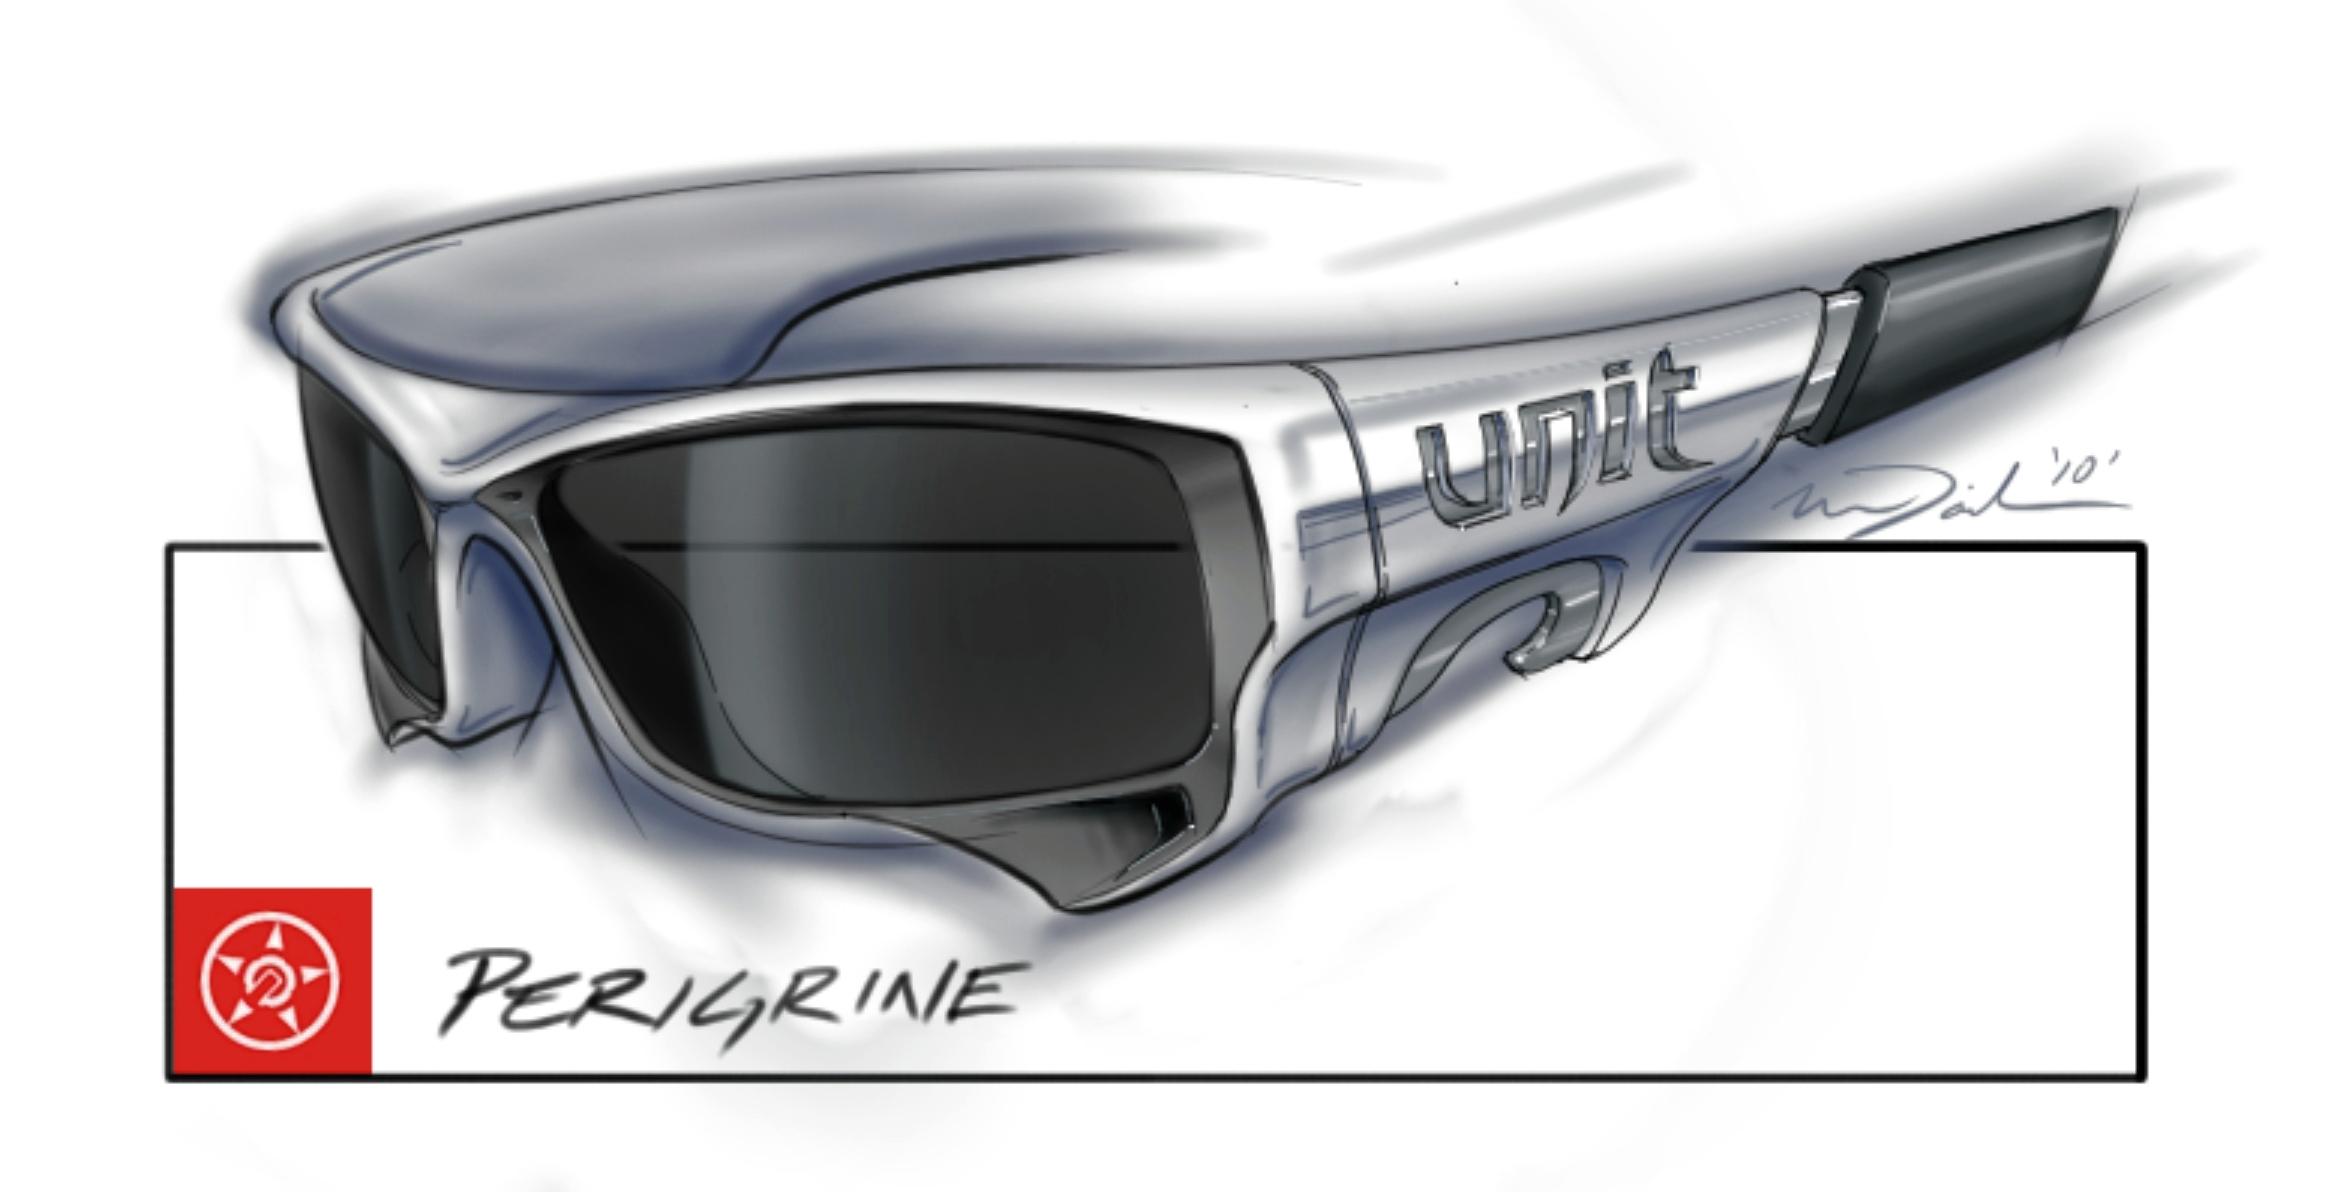 Unit Perigrine Glasses Concepts.JPG